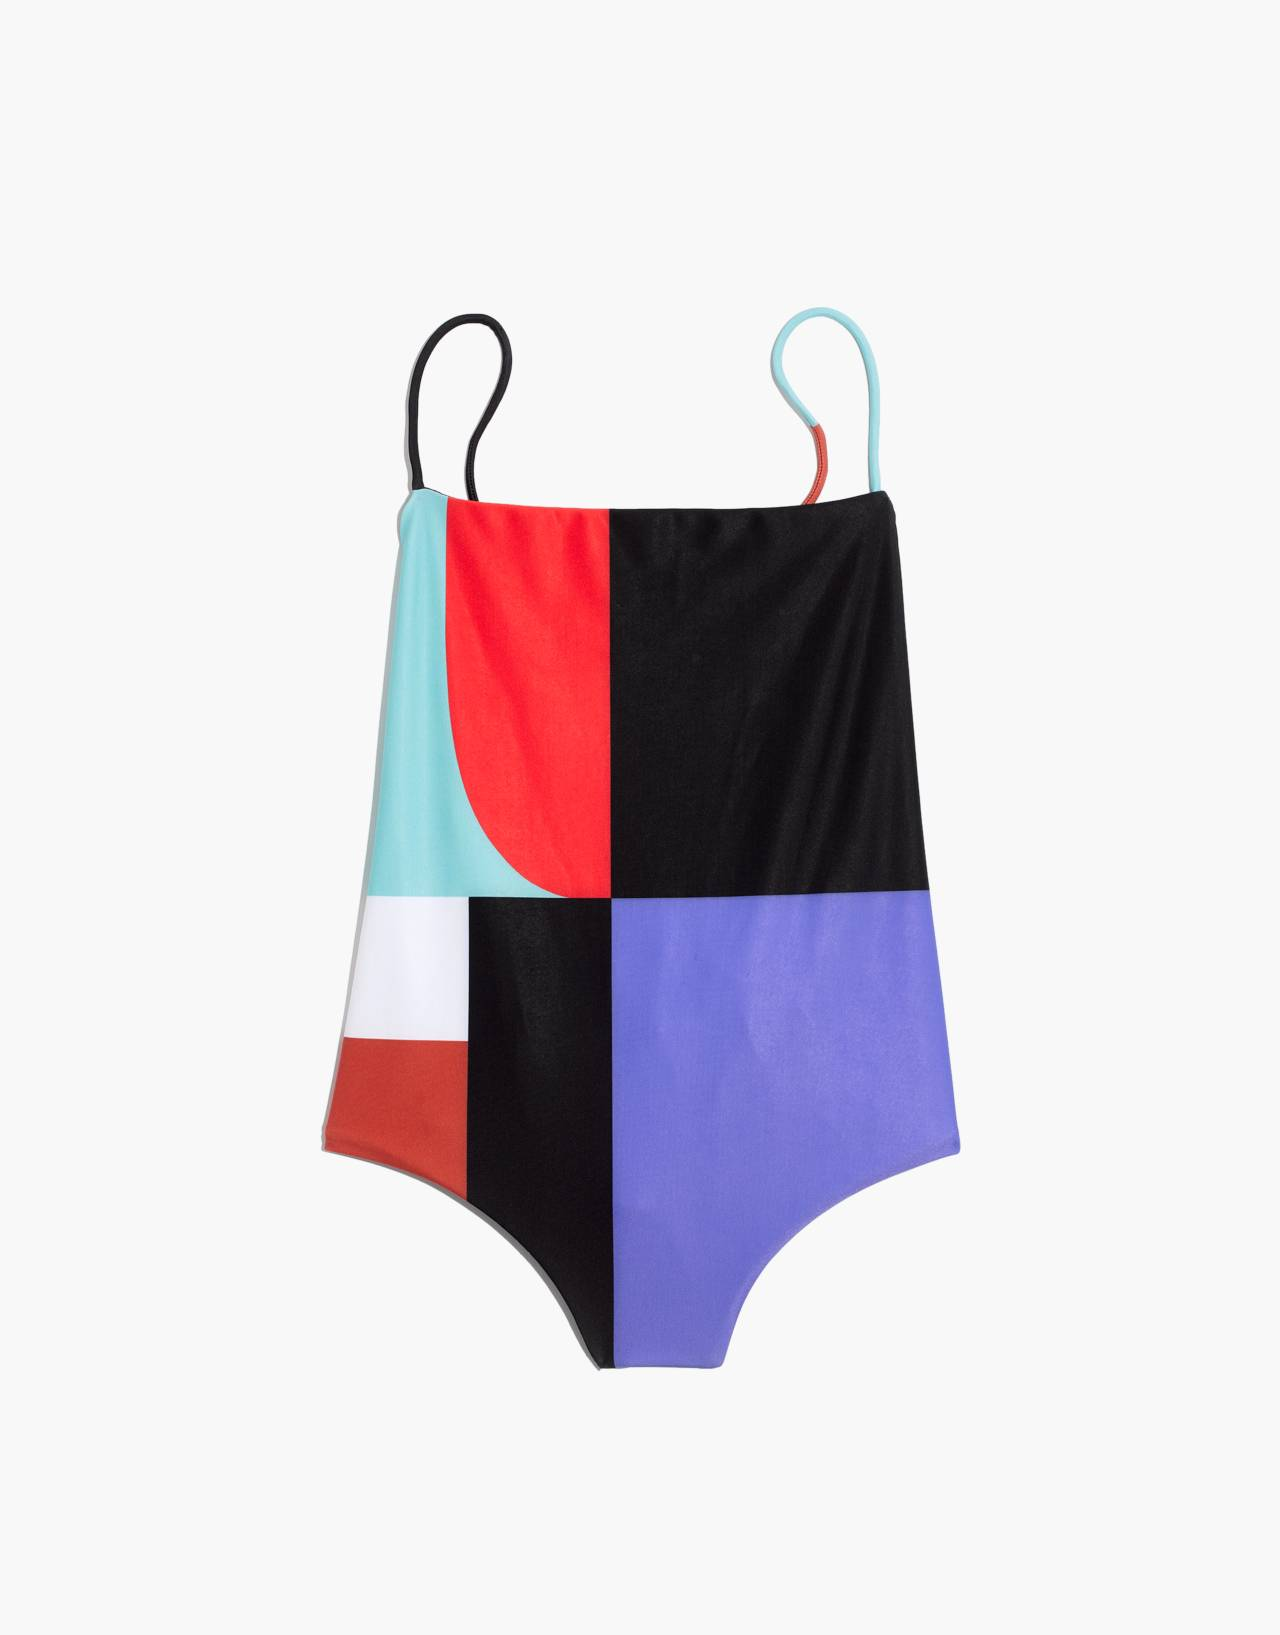 Mara Hoffman® Olympia One-Piece Swimsuit in black multi image 4